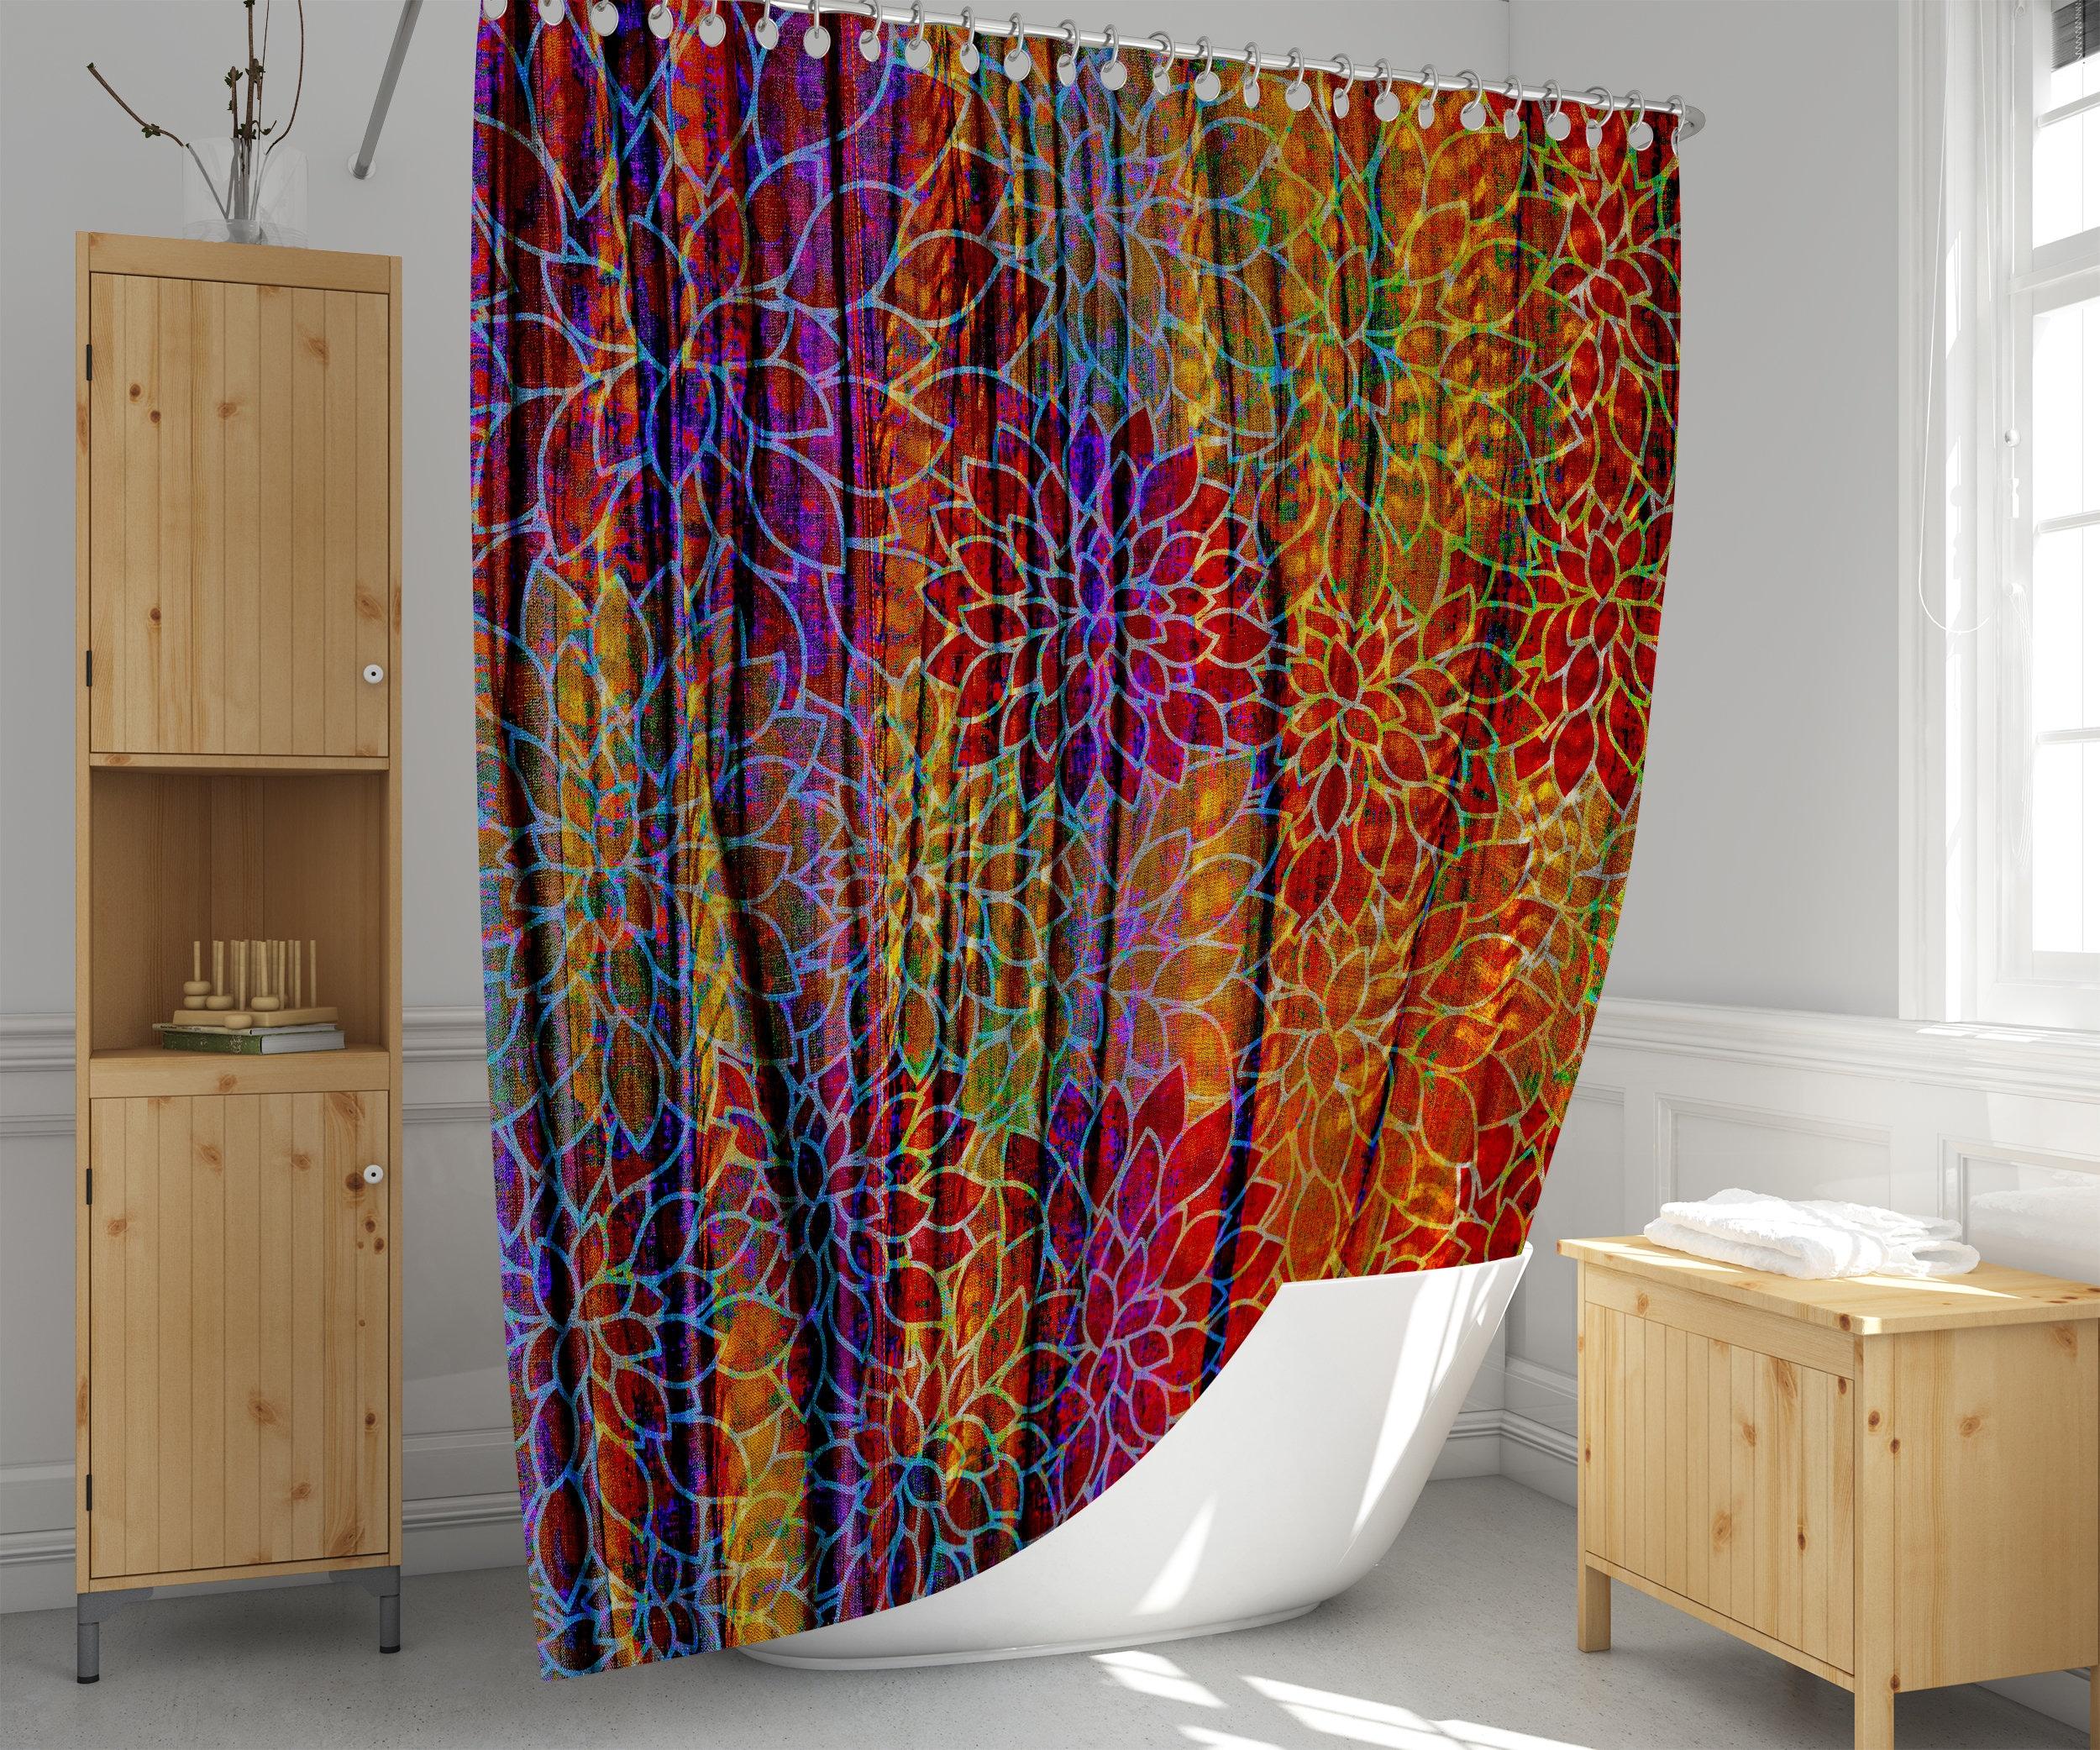 Wavy Boho Shower Curtain Burgundy And Brown Custom Floral Pattern Bathmat Option